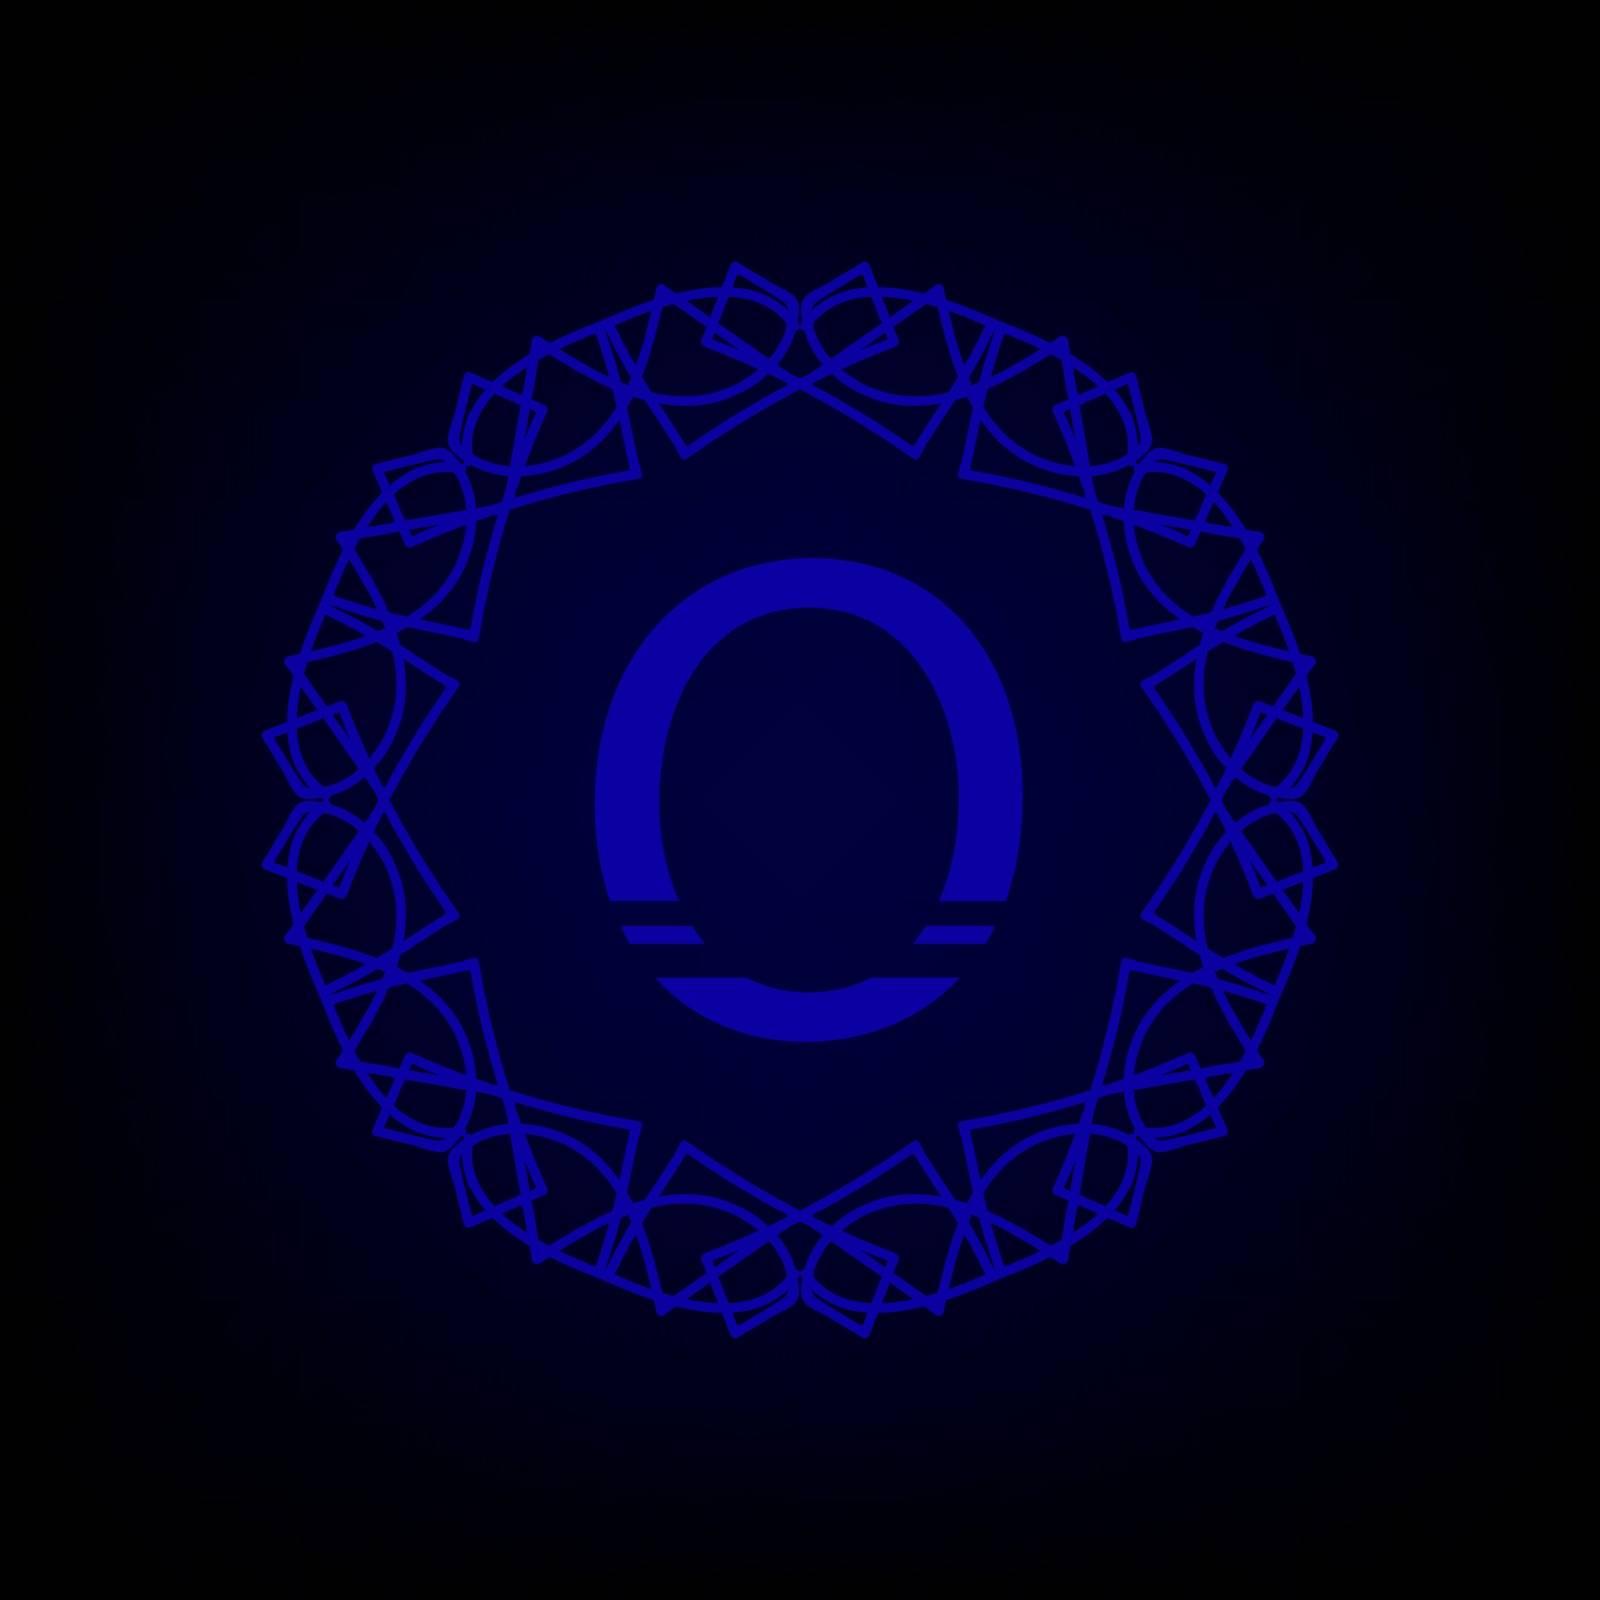 Simple  Monogram O Design Template on Dark Background